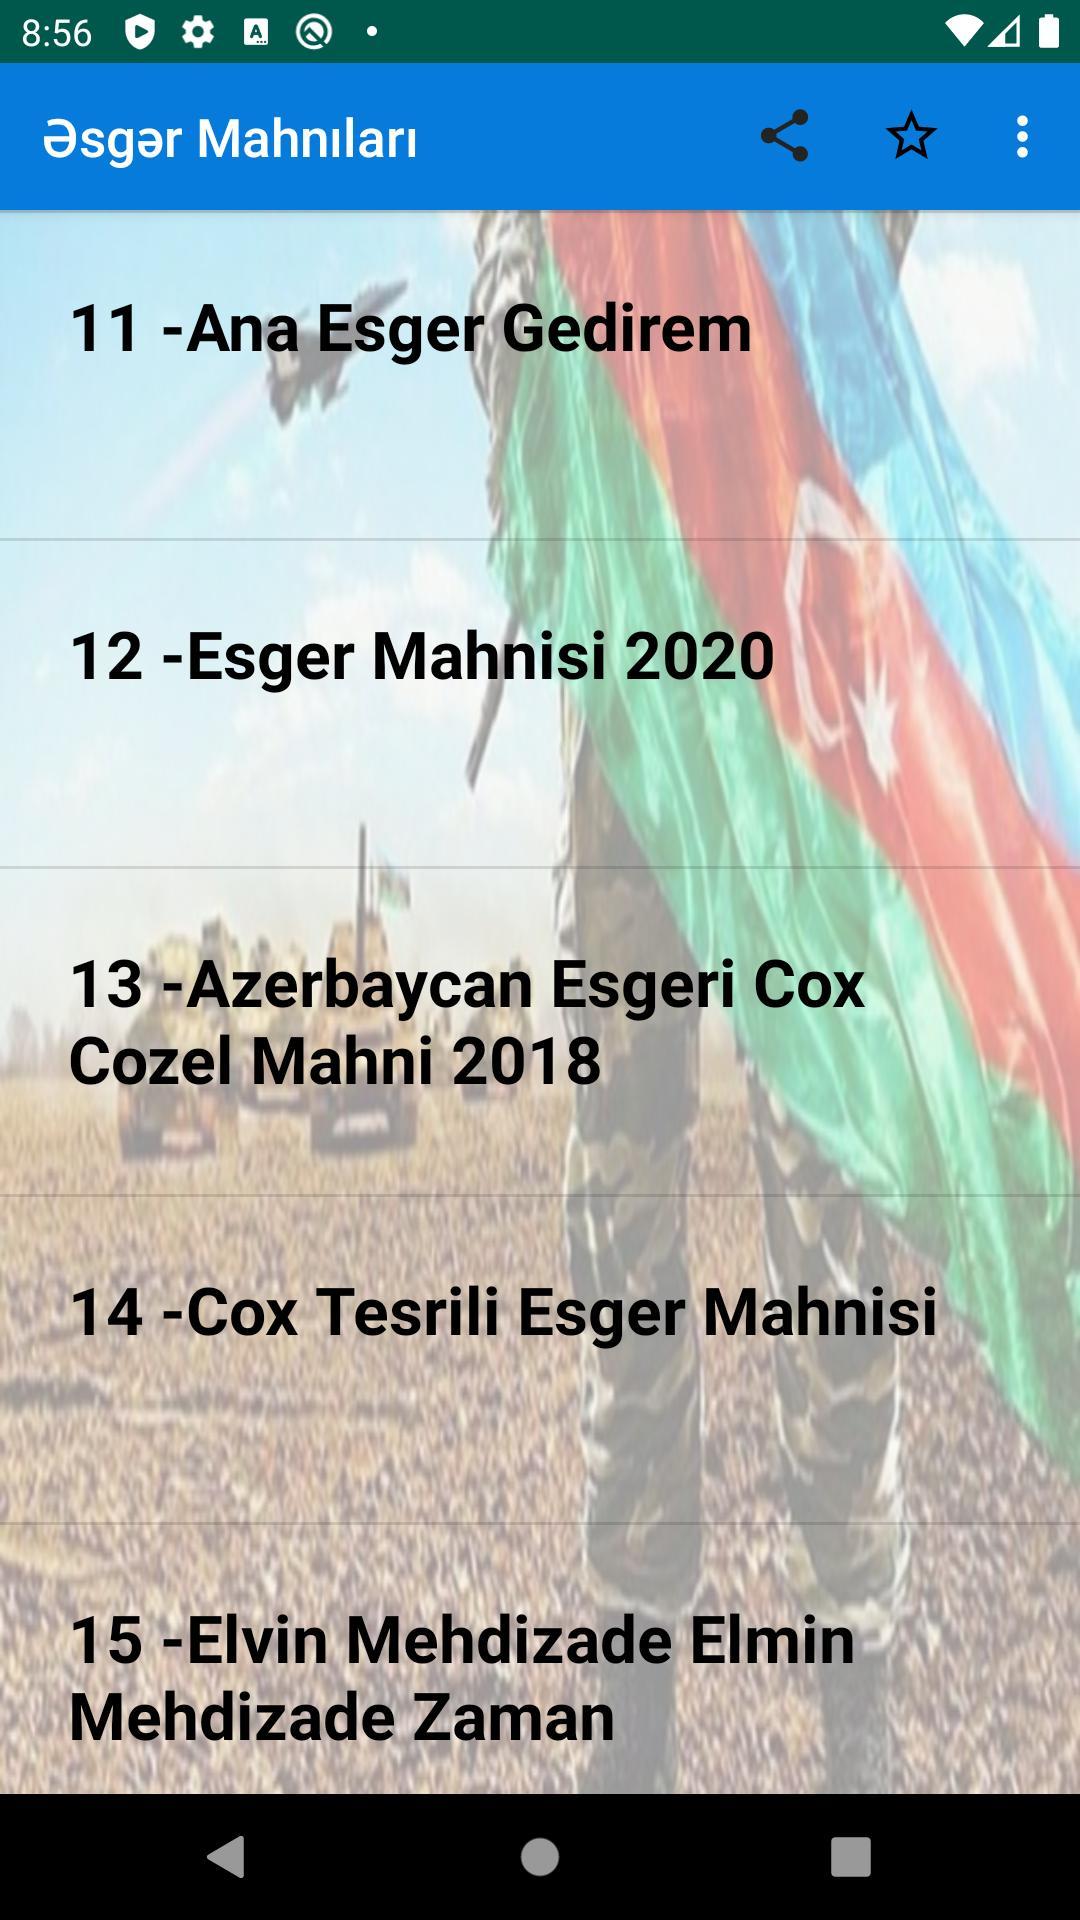 Azerbaycan Esger Mahnilari 2021 Oflayn For Android Apk Download